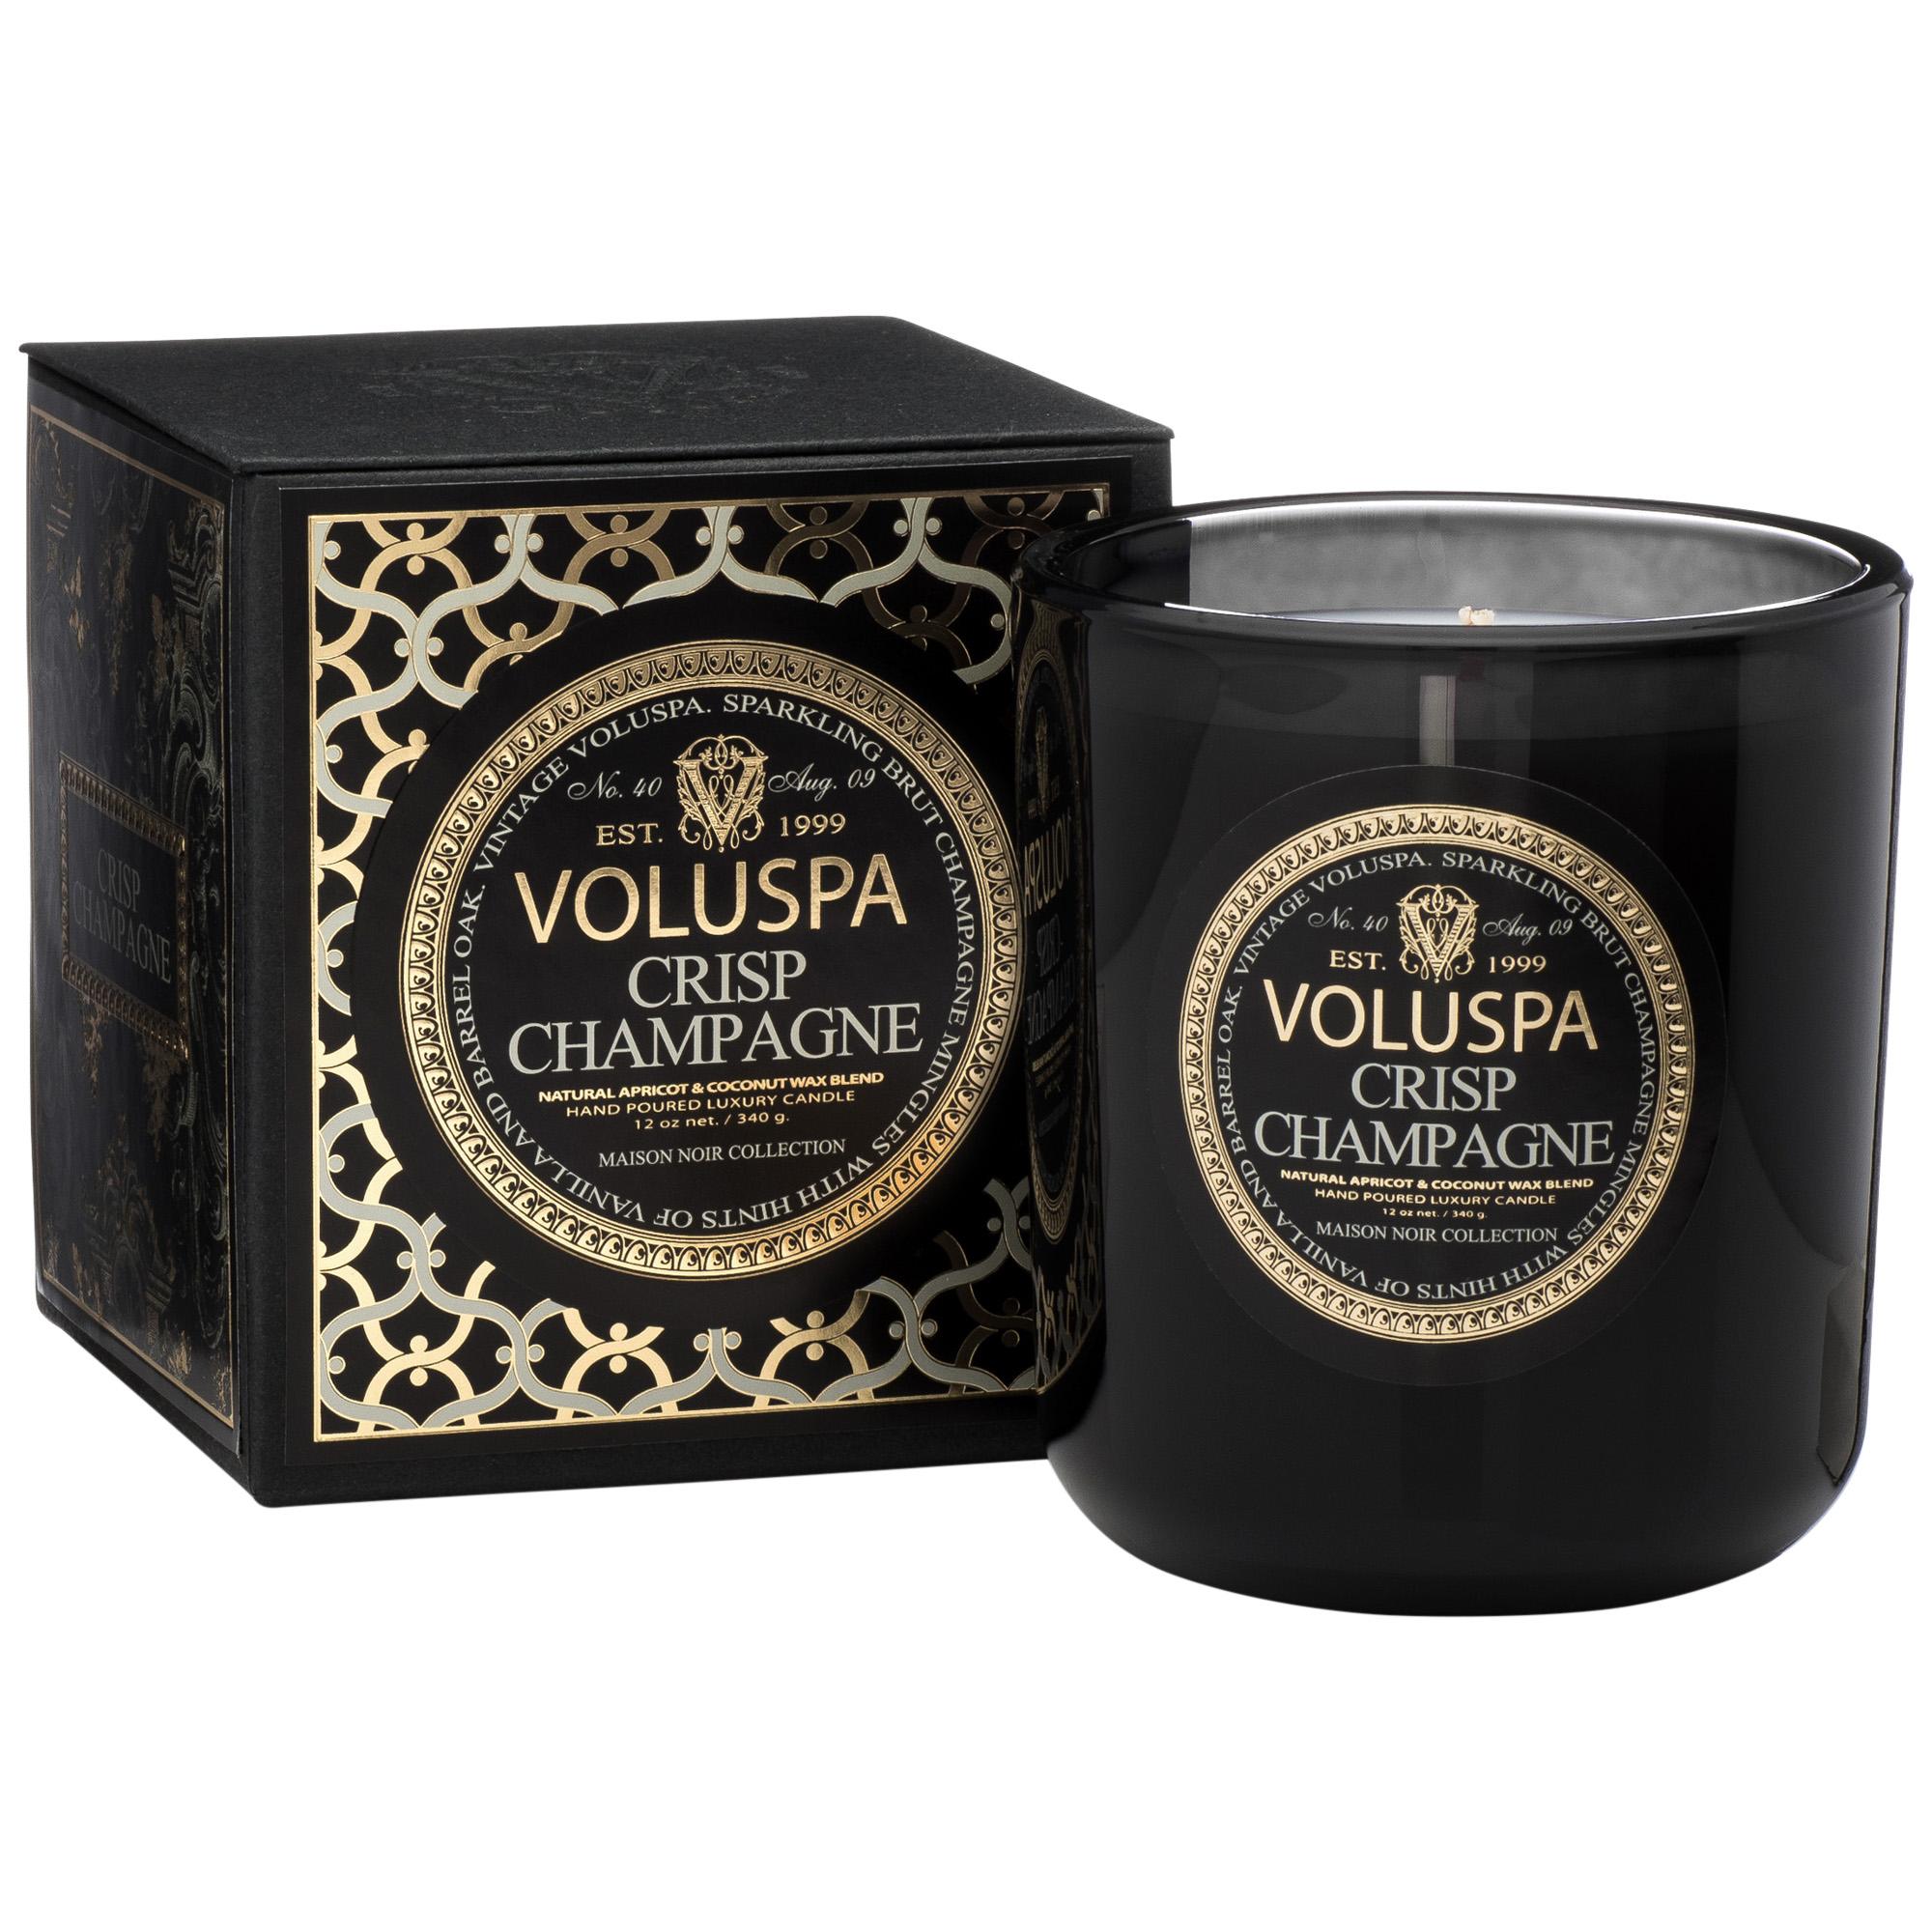 Voluspa - Crisp Champagne